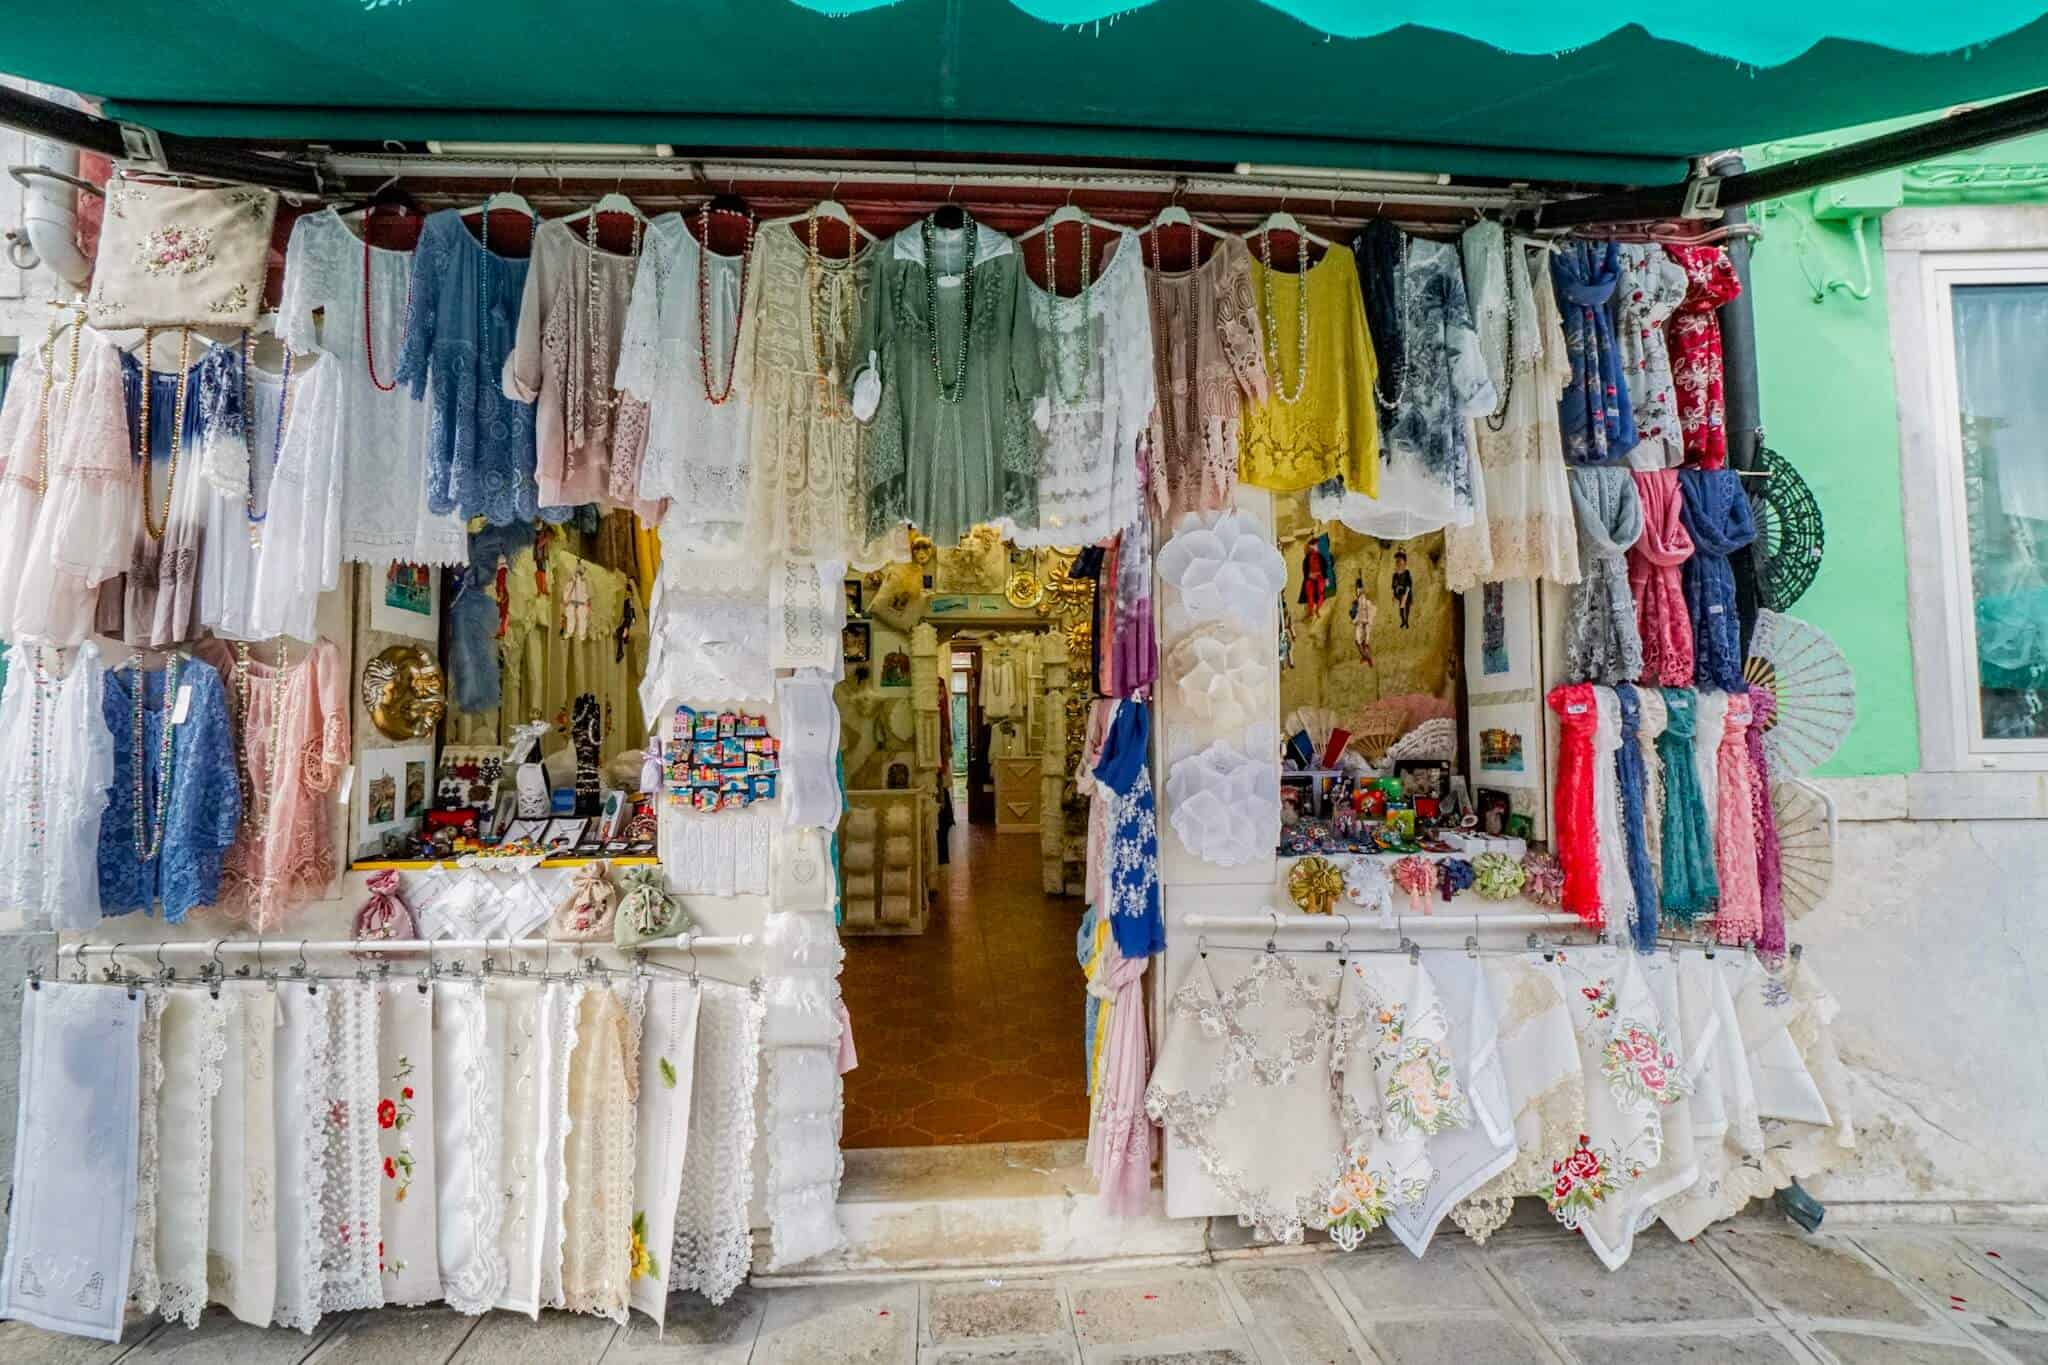 Burano Lace Cloths